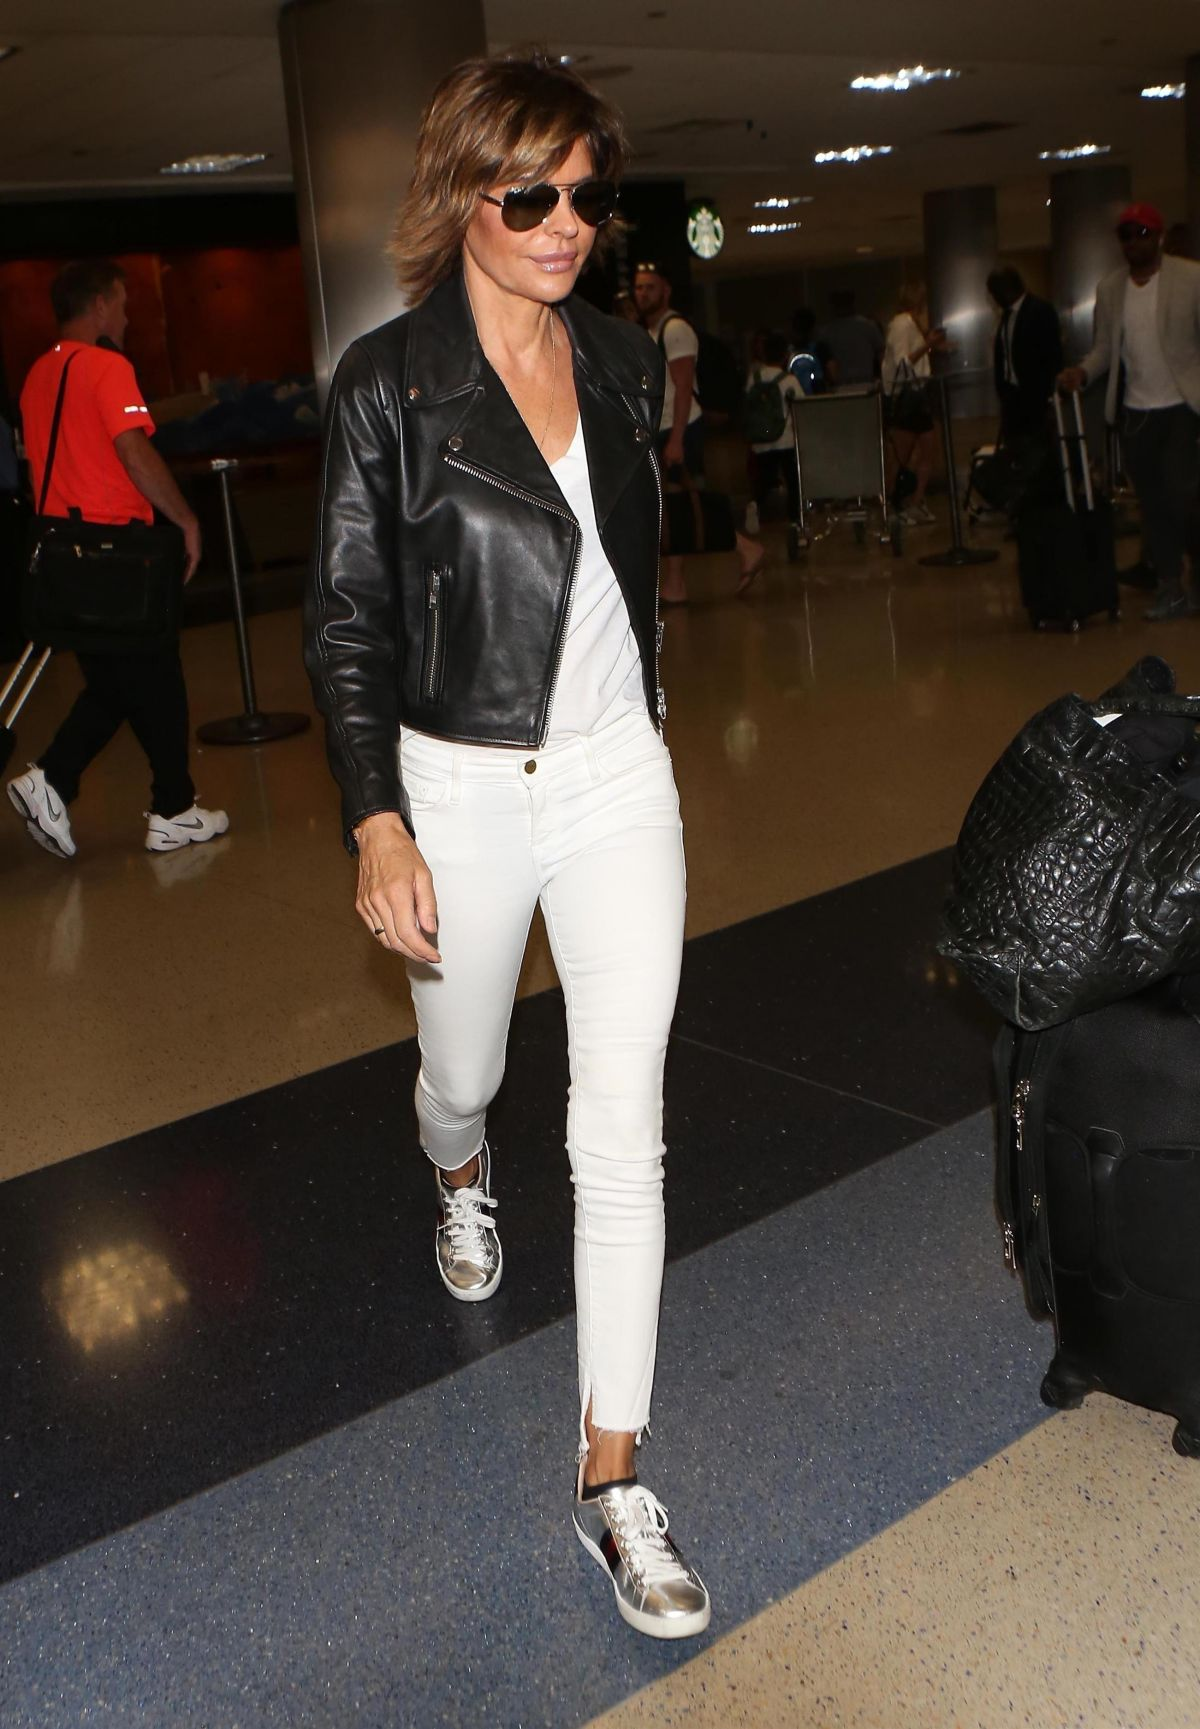 LISA RINNA at LAX Airport in Los Angeles 07/08/2017